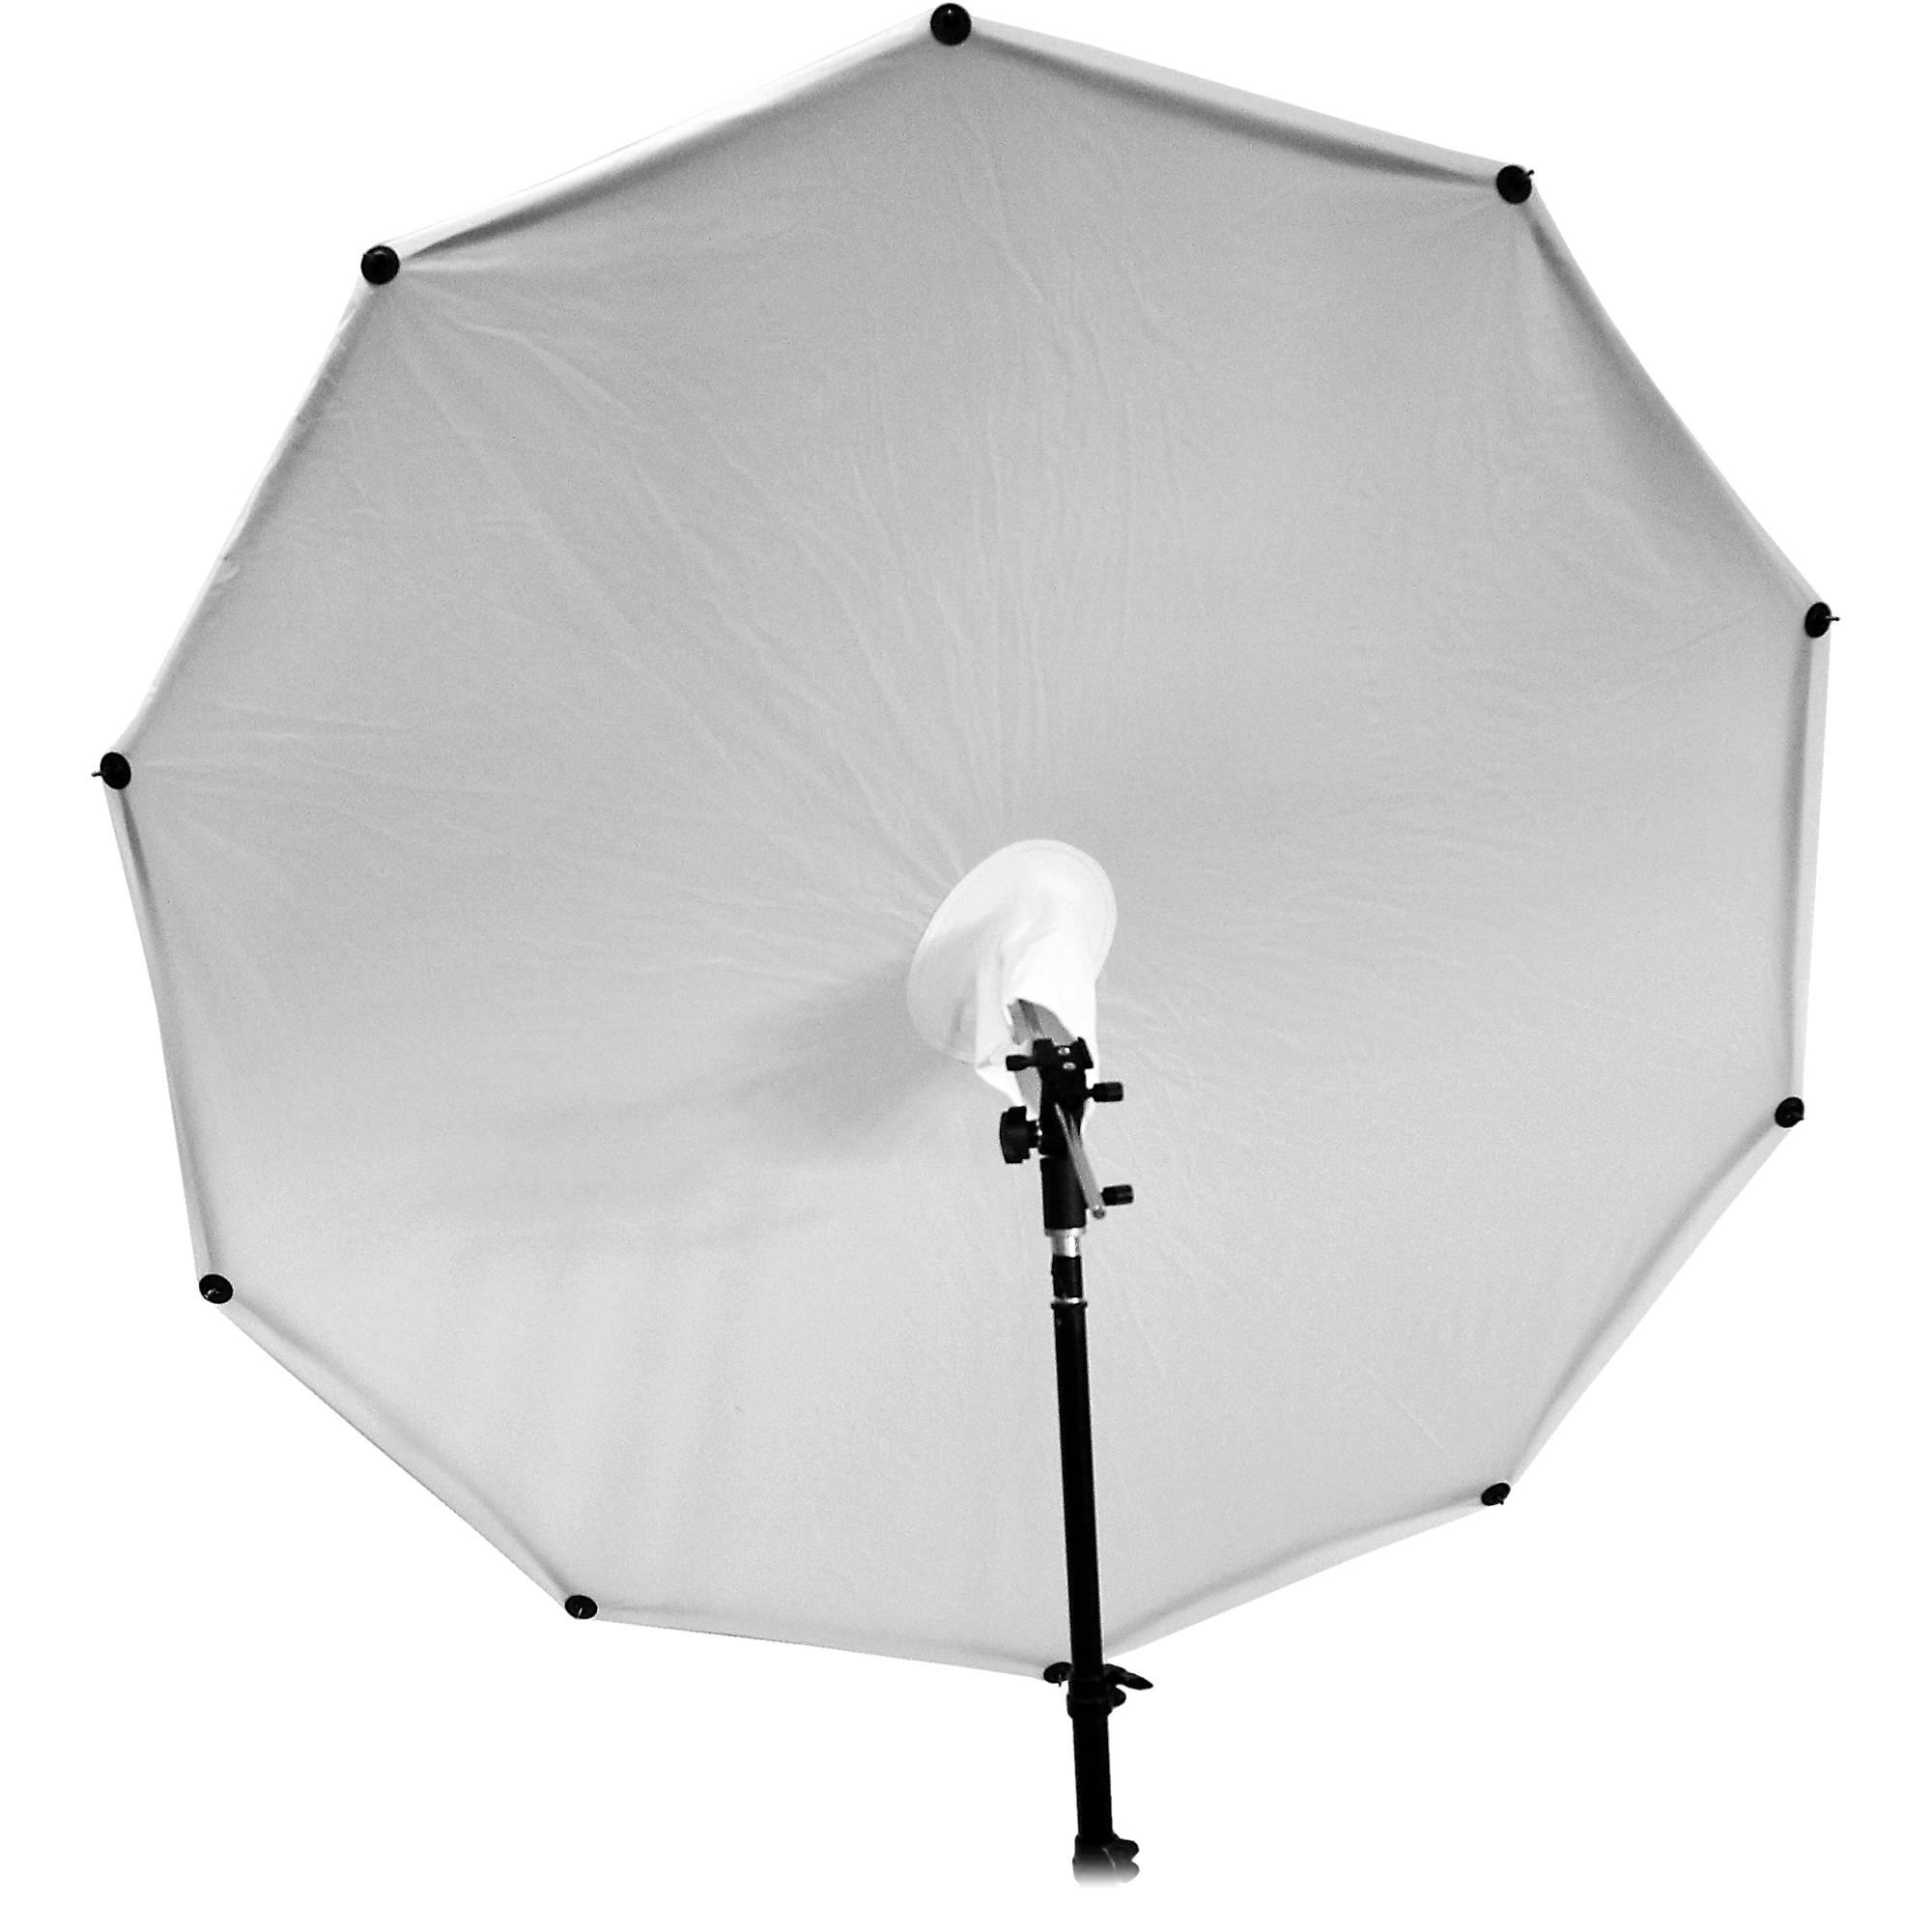 Umbrella Into Softbox: Photek SoftLighter Umbrella With Removable 7mm And SL-4000-FGS